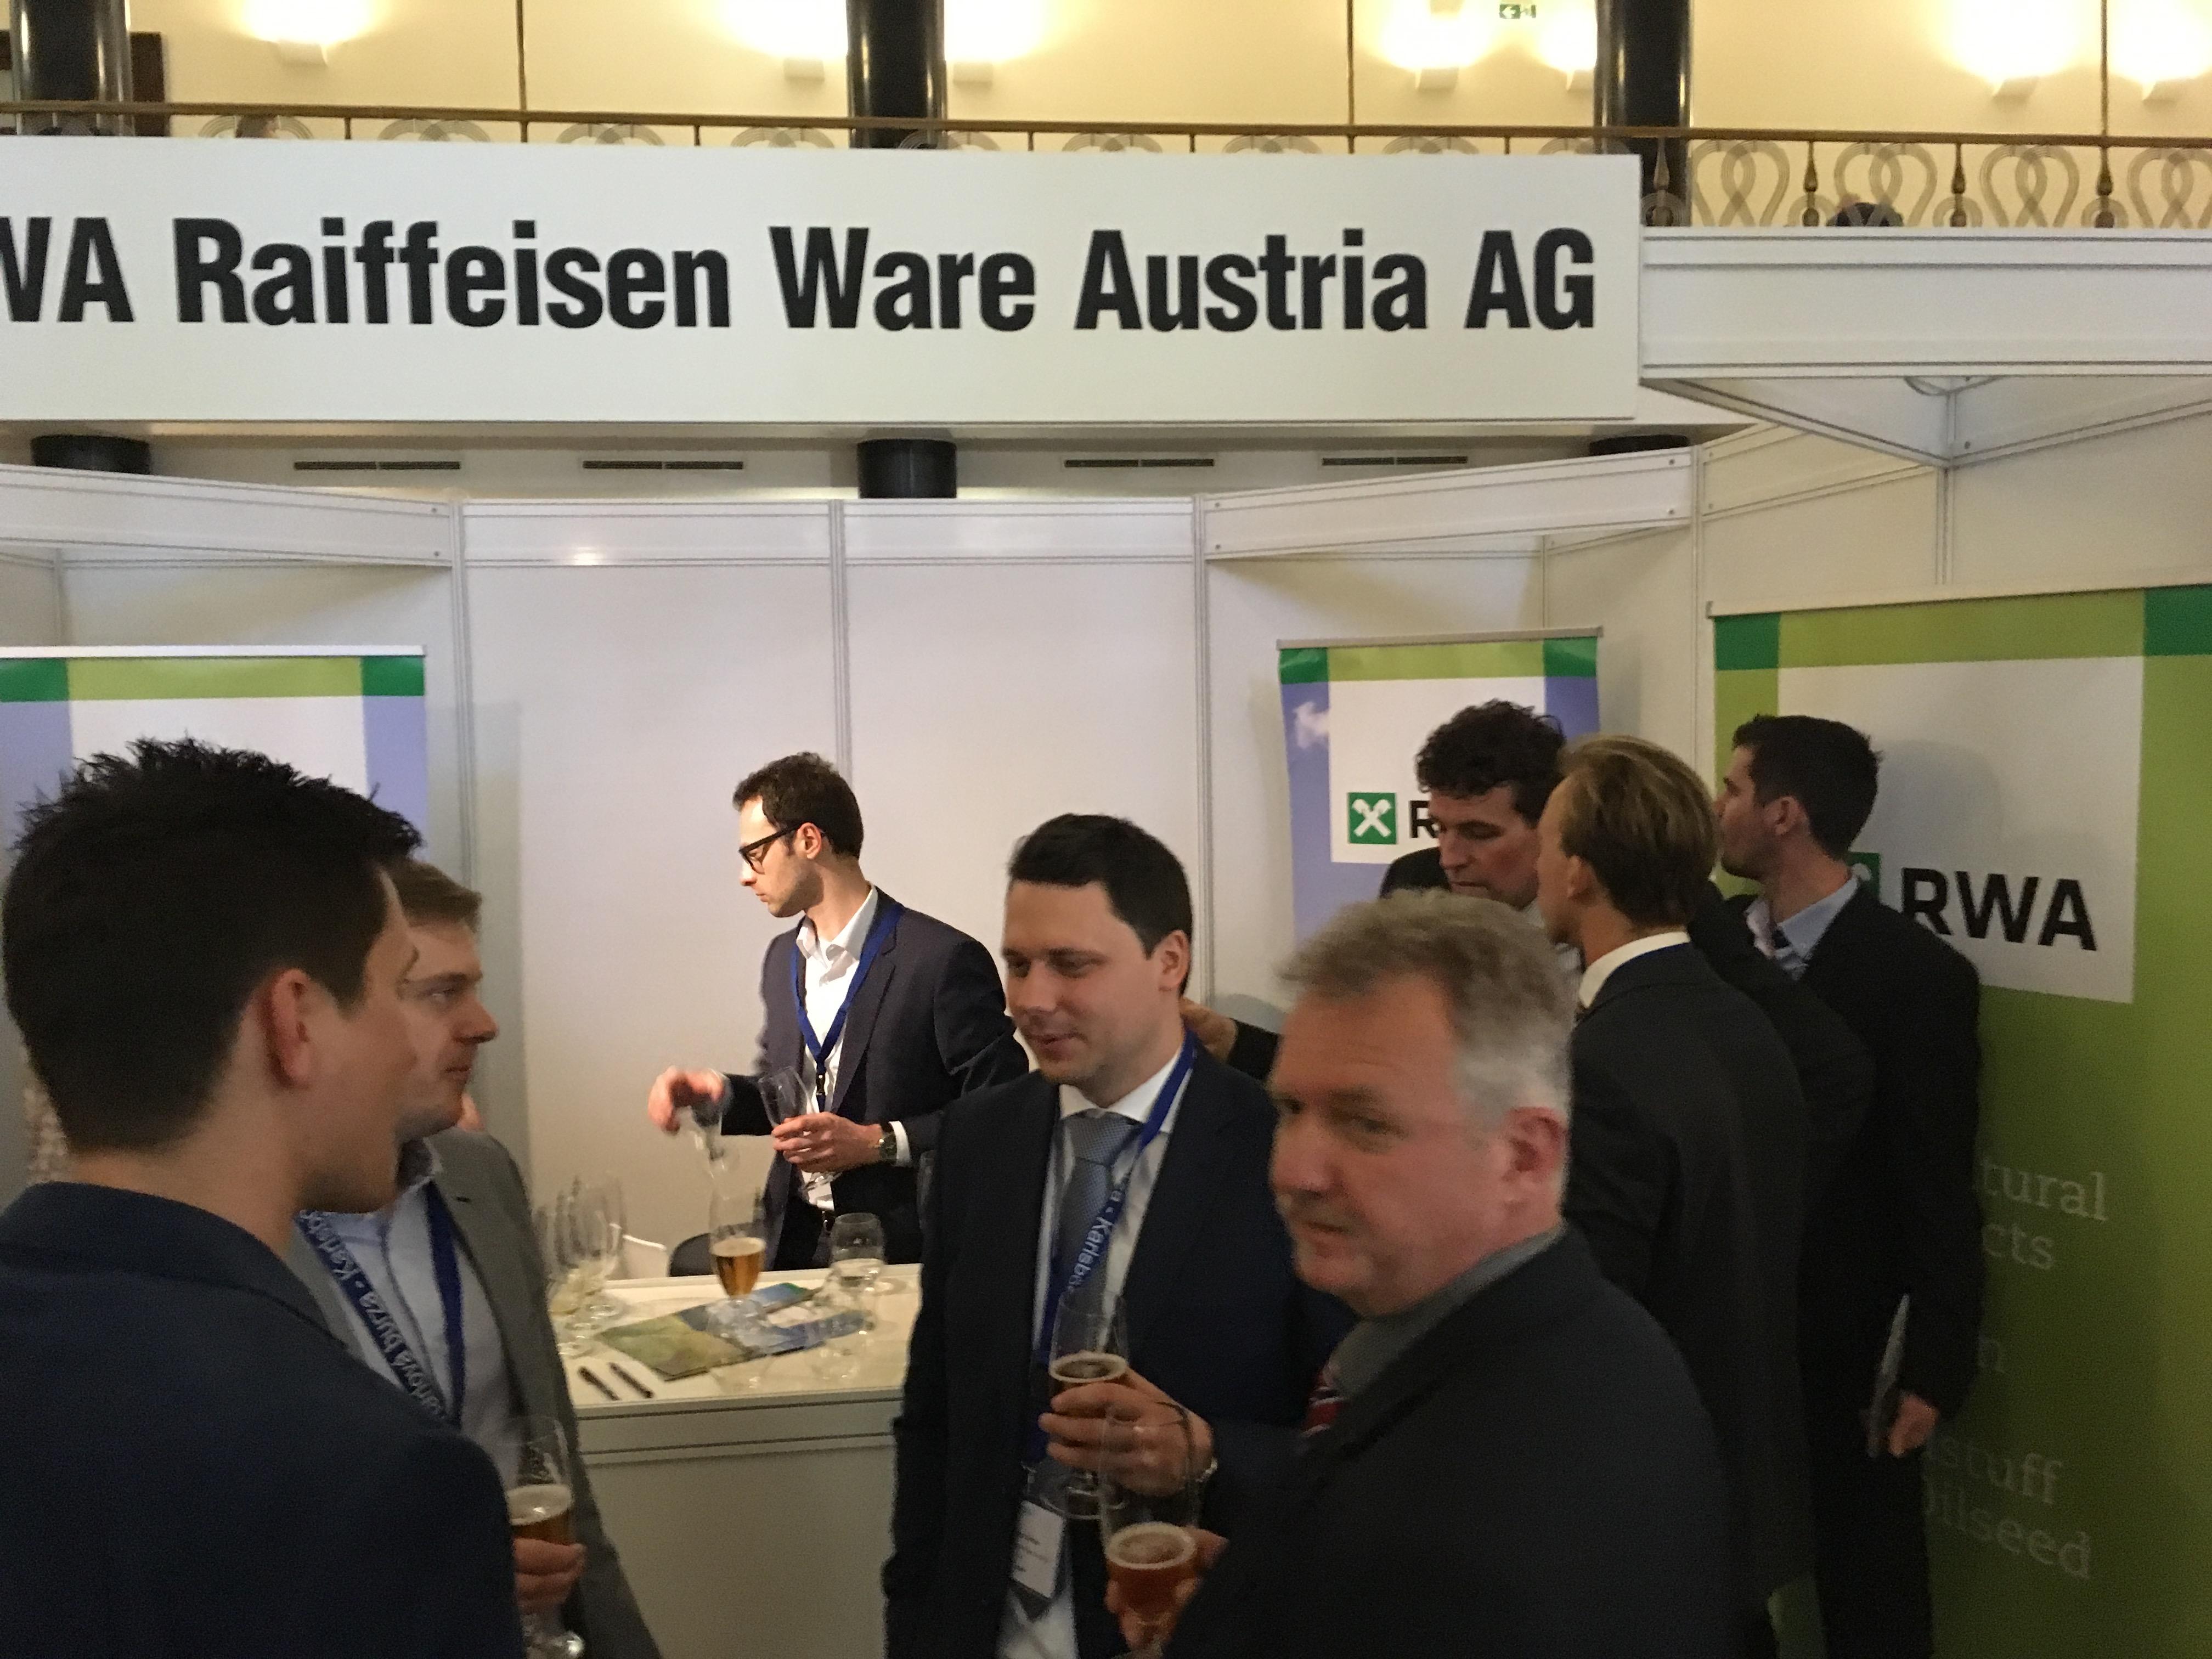 RWA RAiffeisen Ware Austria AG, 3. Prager Karlsbörse @Slovanský-dům